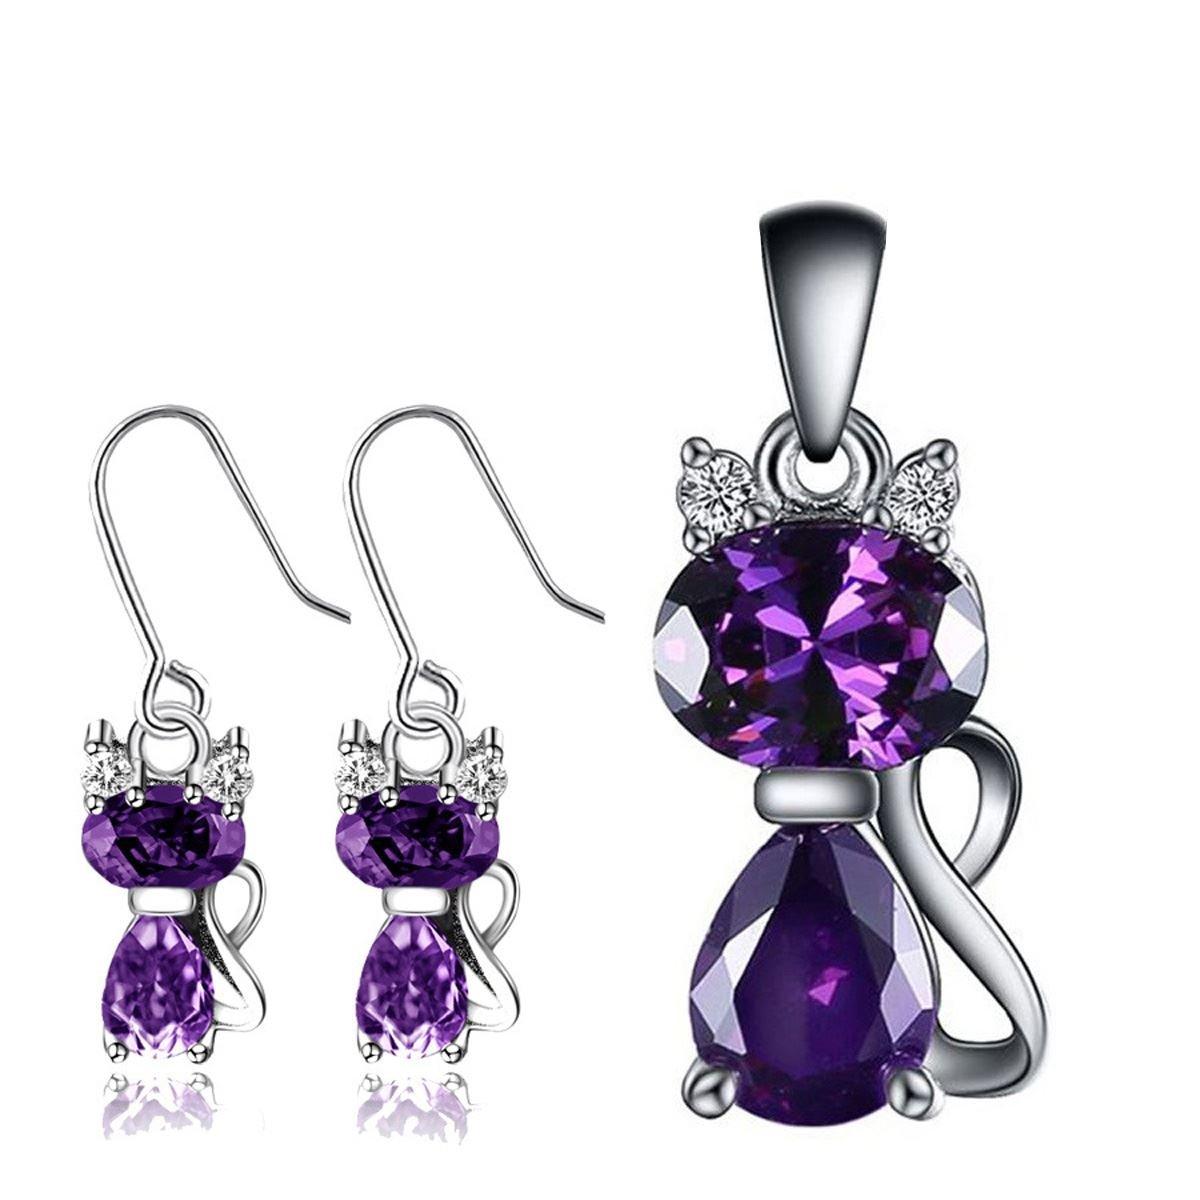 925 Sterling Silver Jewelry Sets Cat Pendant Earrings Set Purple Austria Crystal CZ For Women Female Fashion Bridal Jewelry